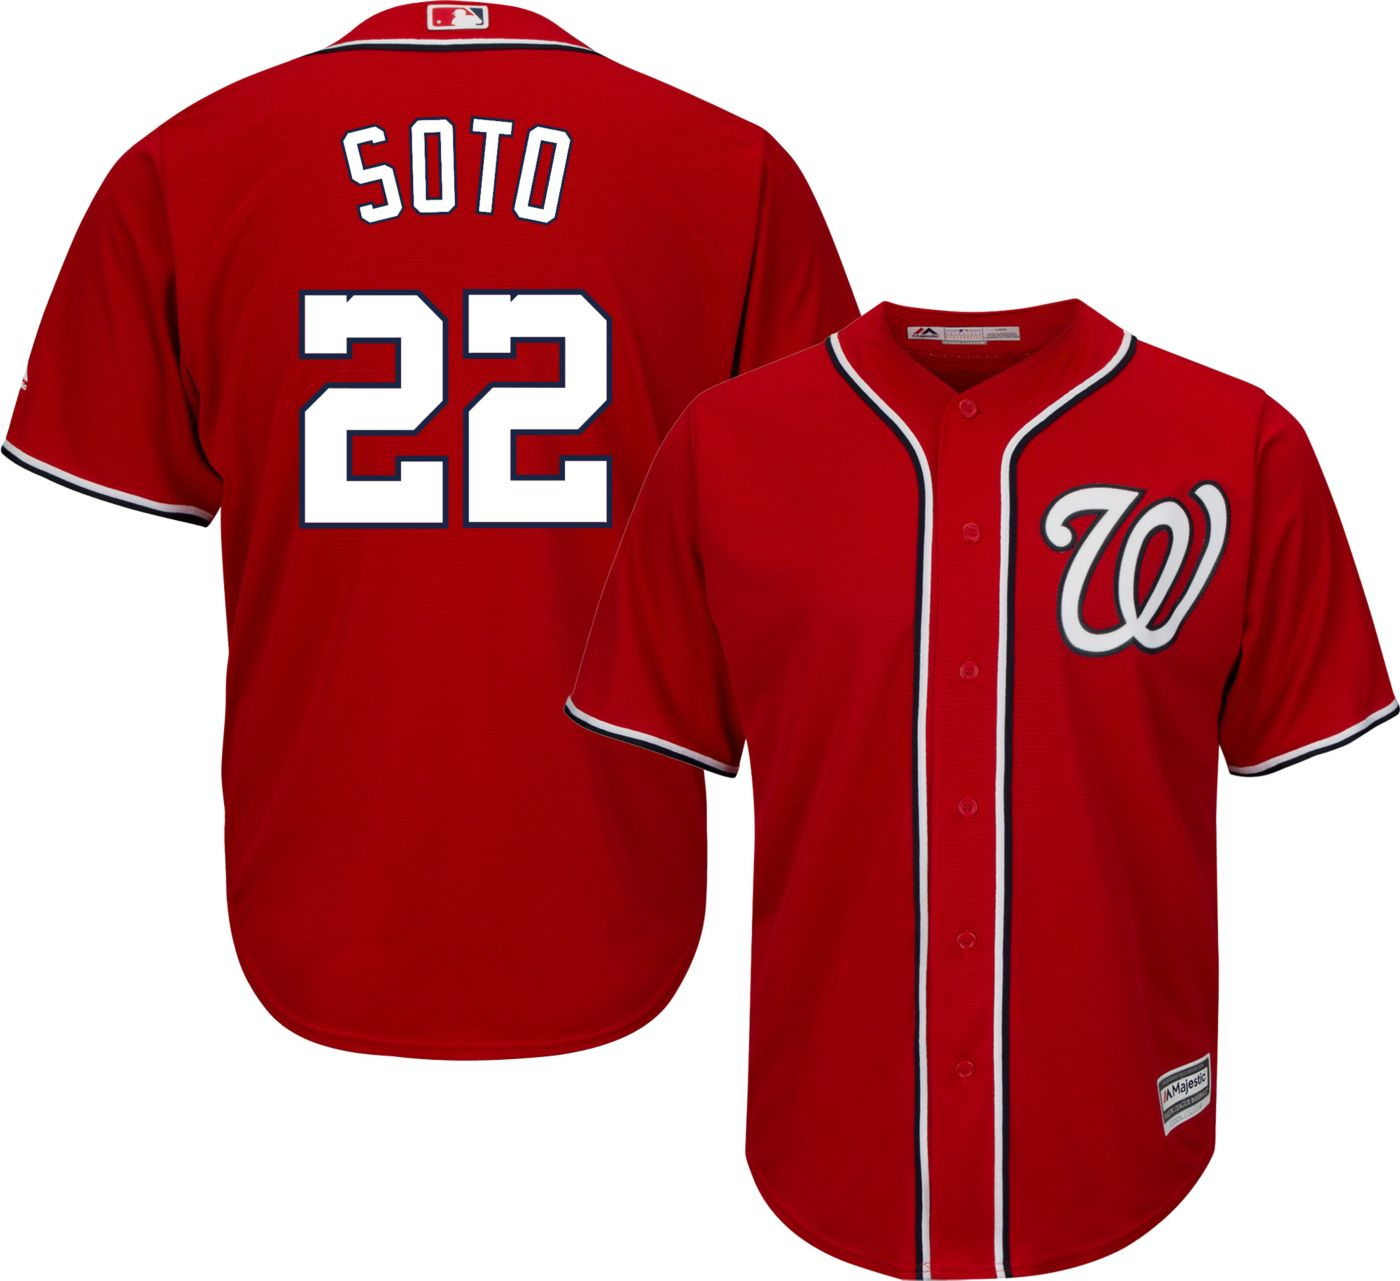 Youth Replica Washington Nationals Juan Soto #22 Alternate Red Jersey